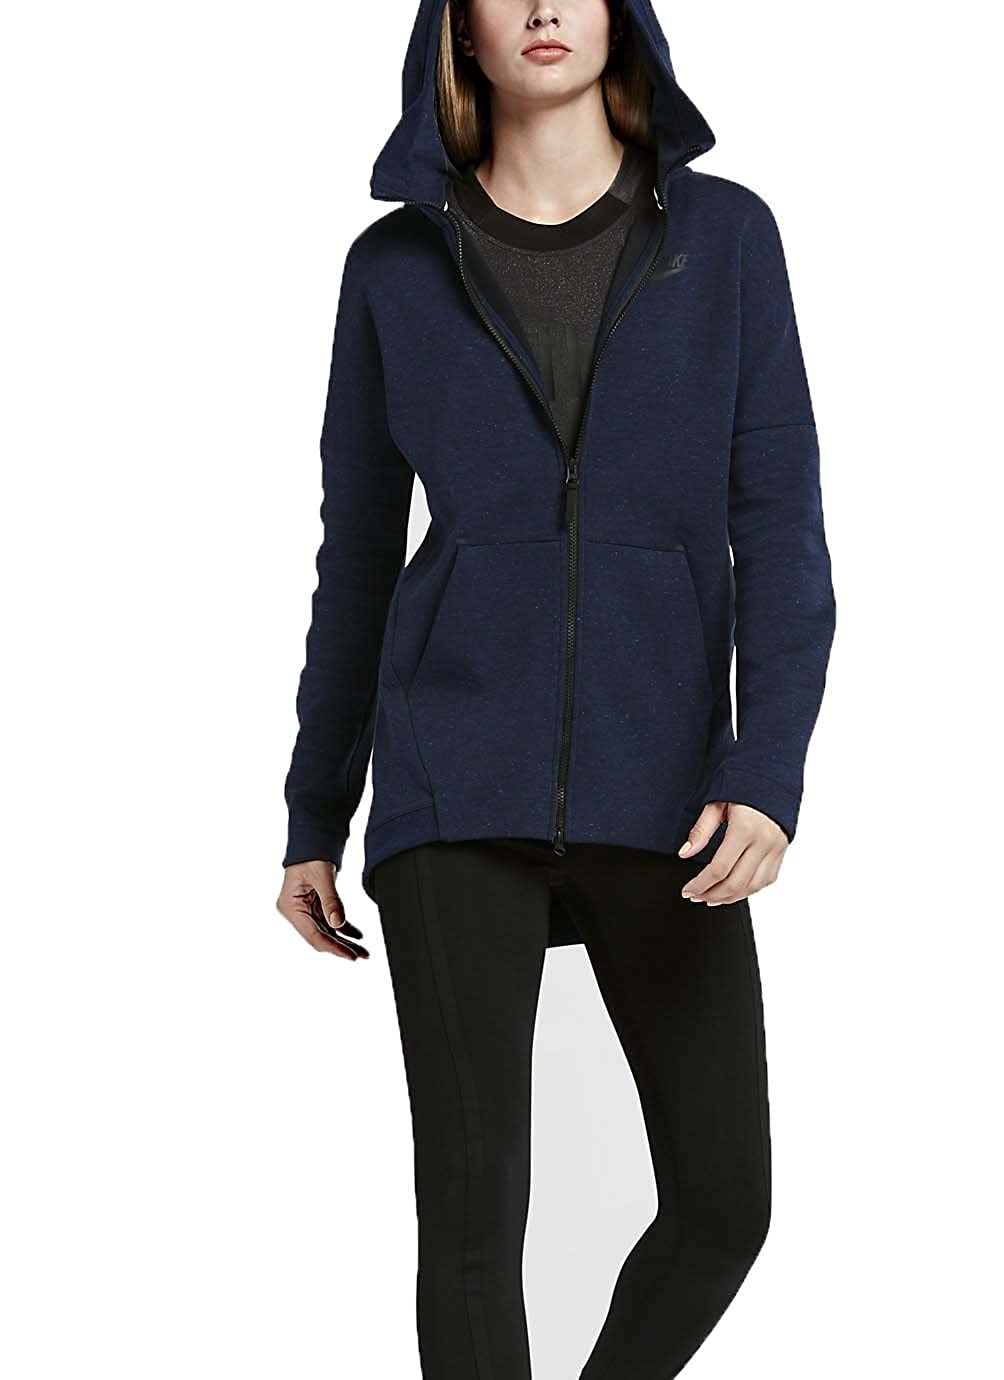 e427006ae998 Amazon.com  Nike Women s NSW Tech Fleece Knit Cape Full Zip HOODIE JACKET  (S)  Sports   Outdoors